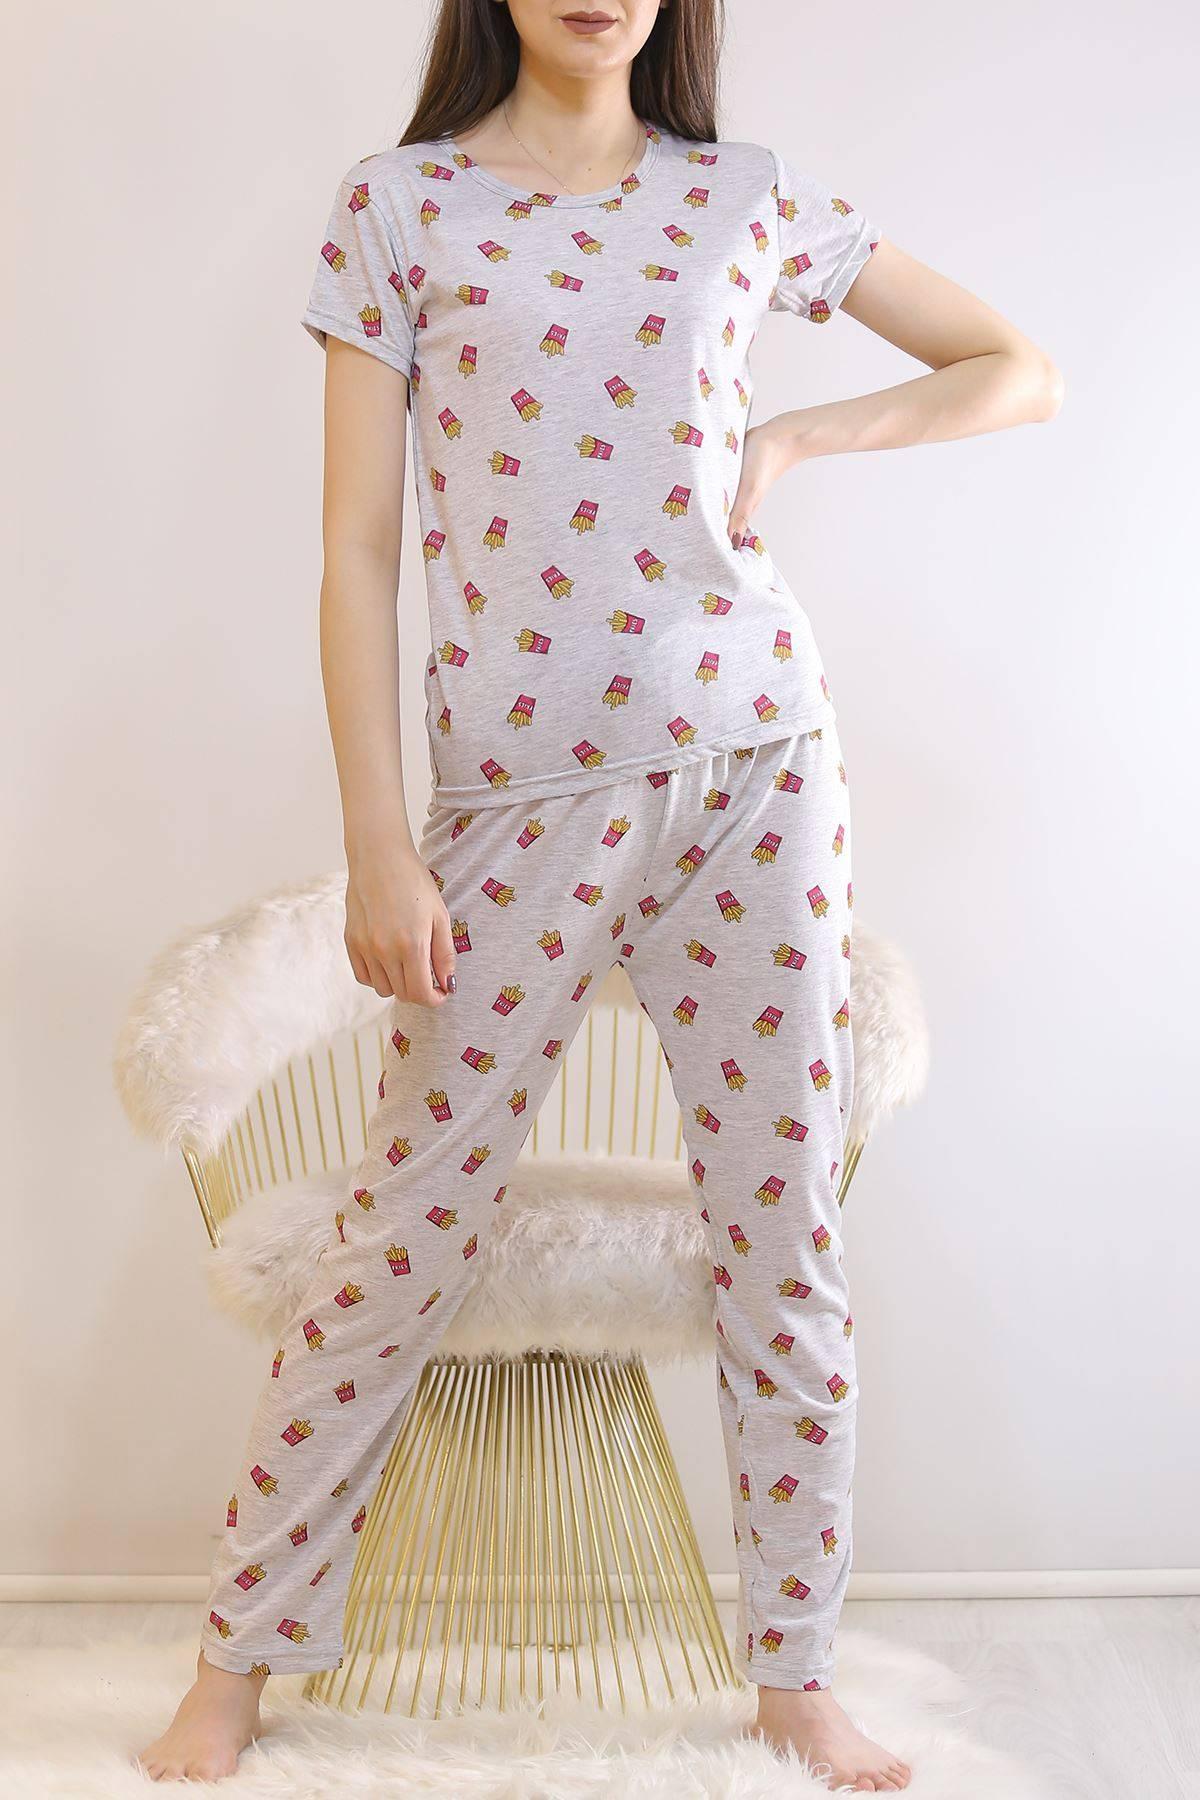 Desenli Pijama Takımı Gri - 130.1287.